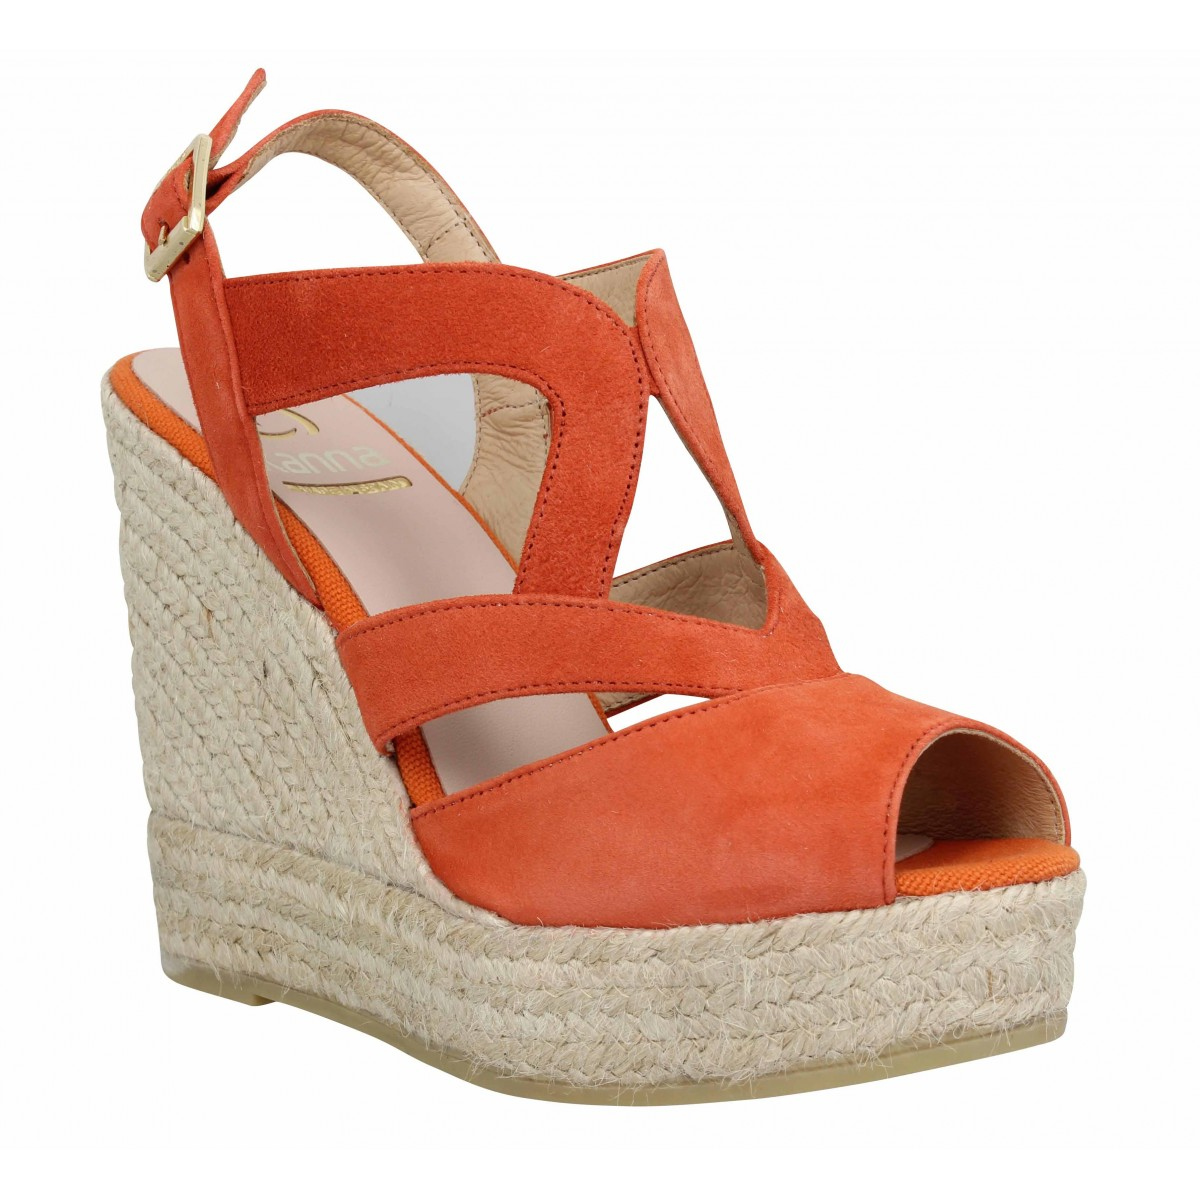 Sandales talons KANNA 4043 velours Femme Orange